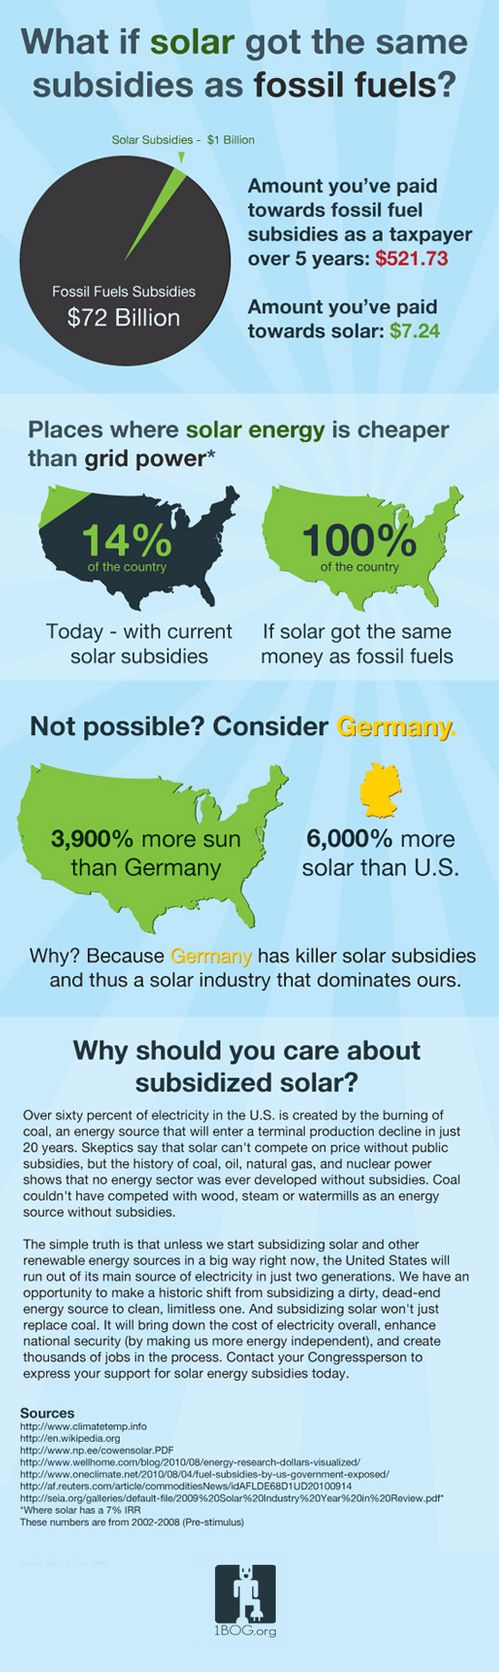 reasons for solar energy subsidies